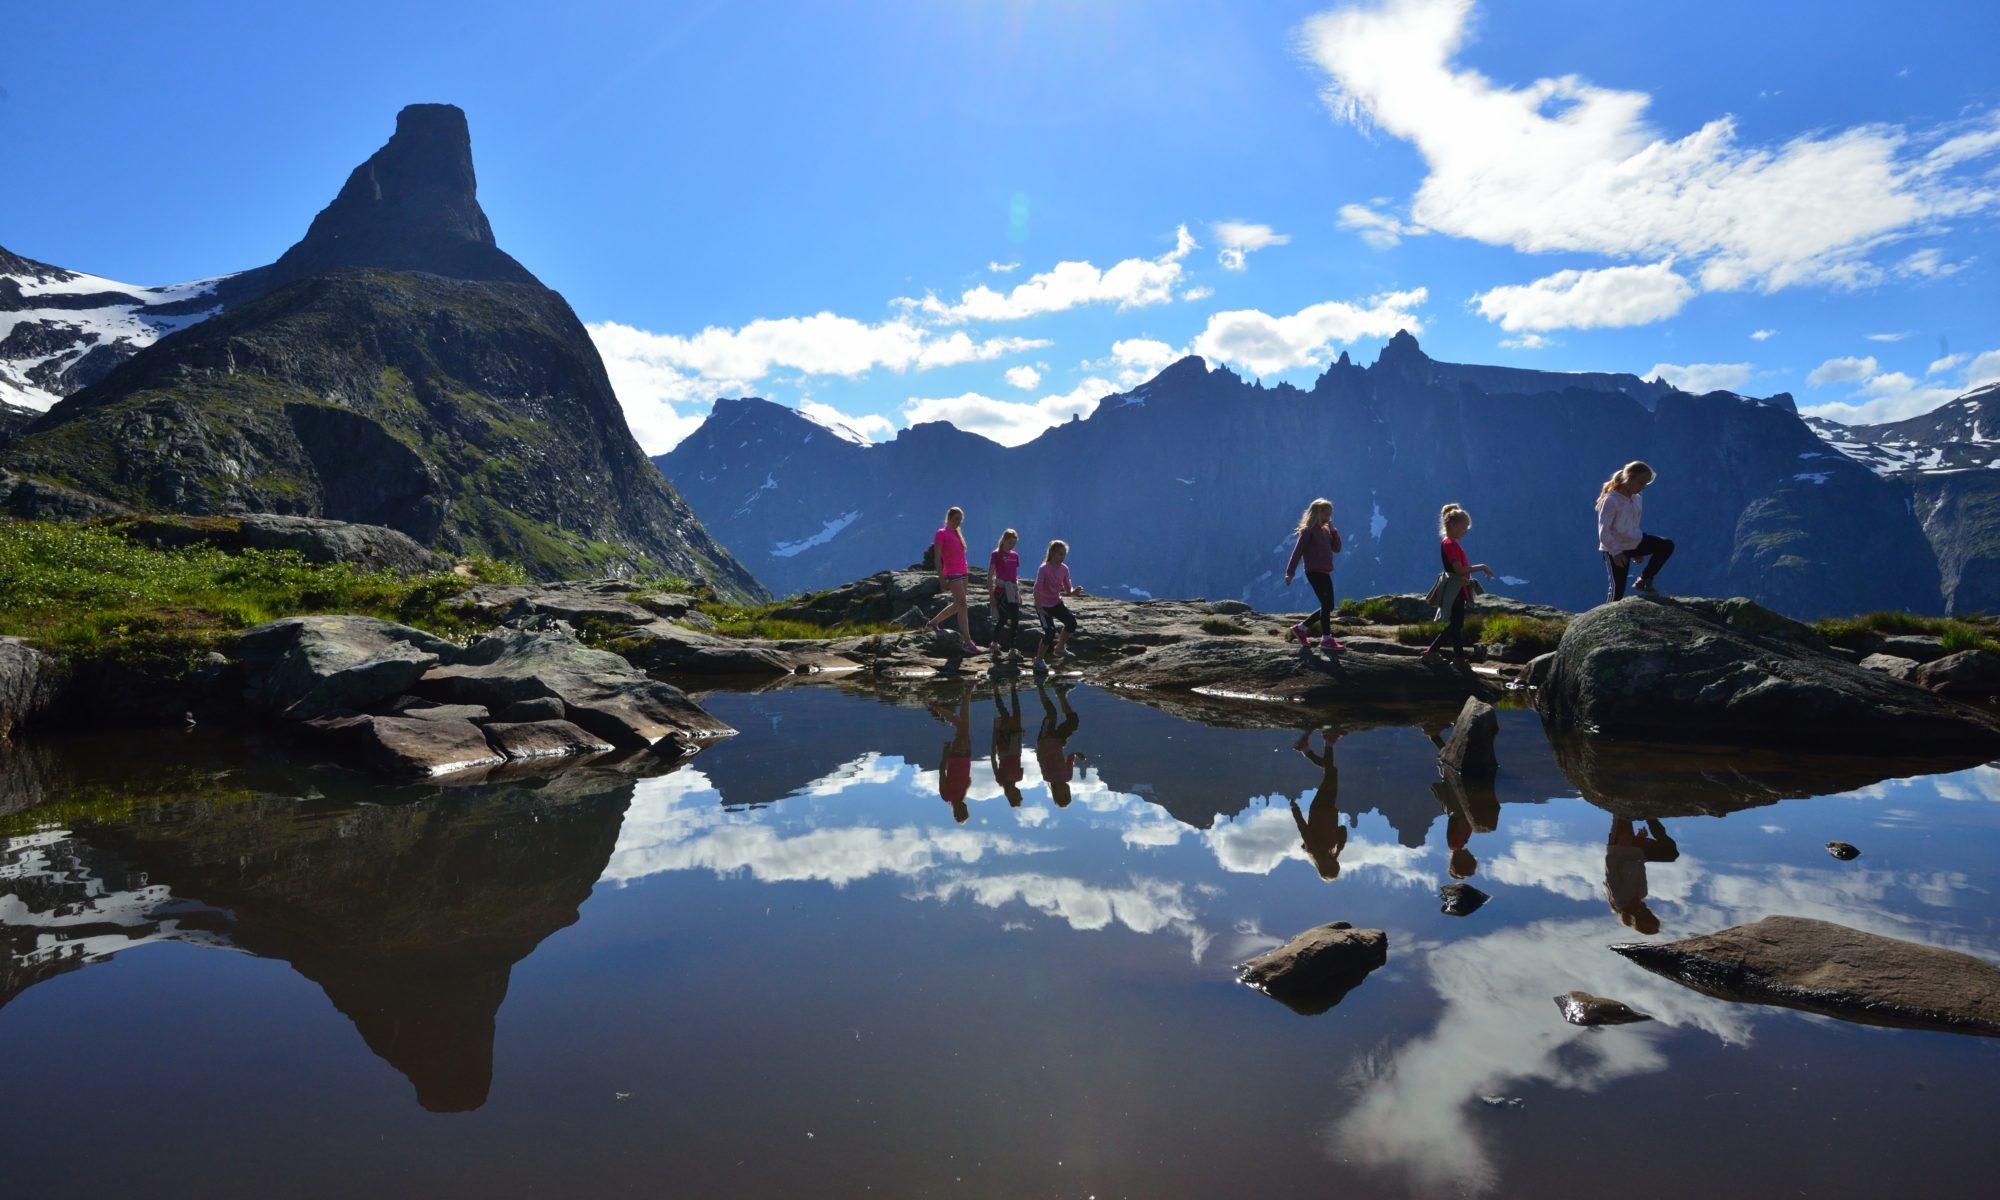 Litlefjellet in Romsdal, Norway